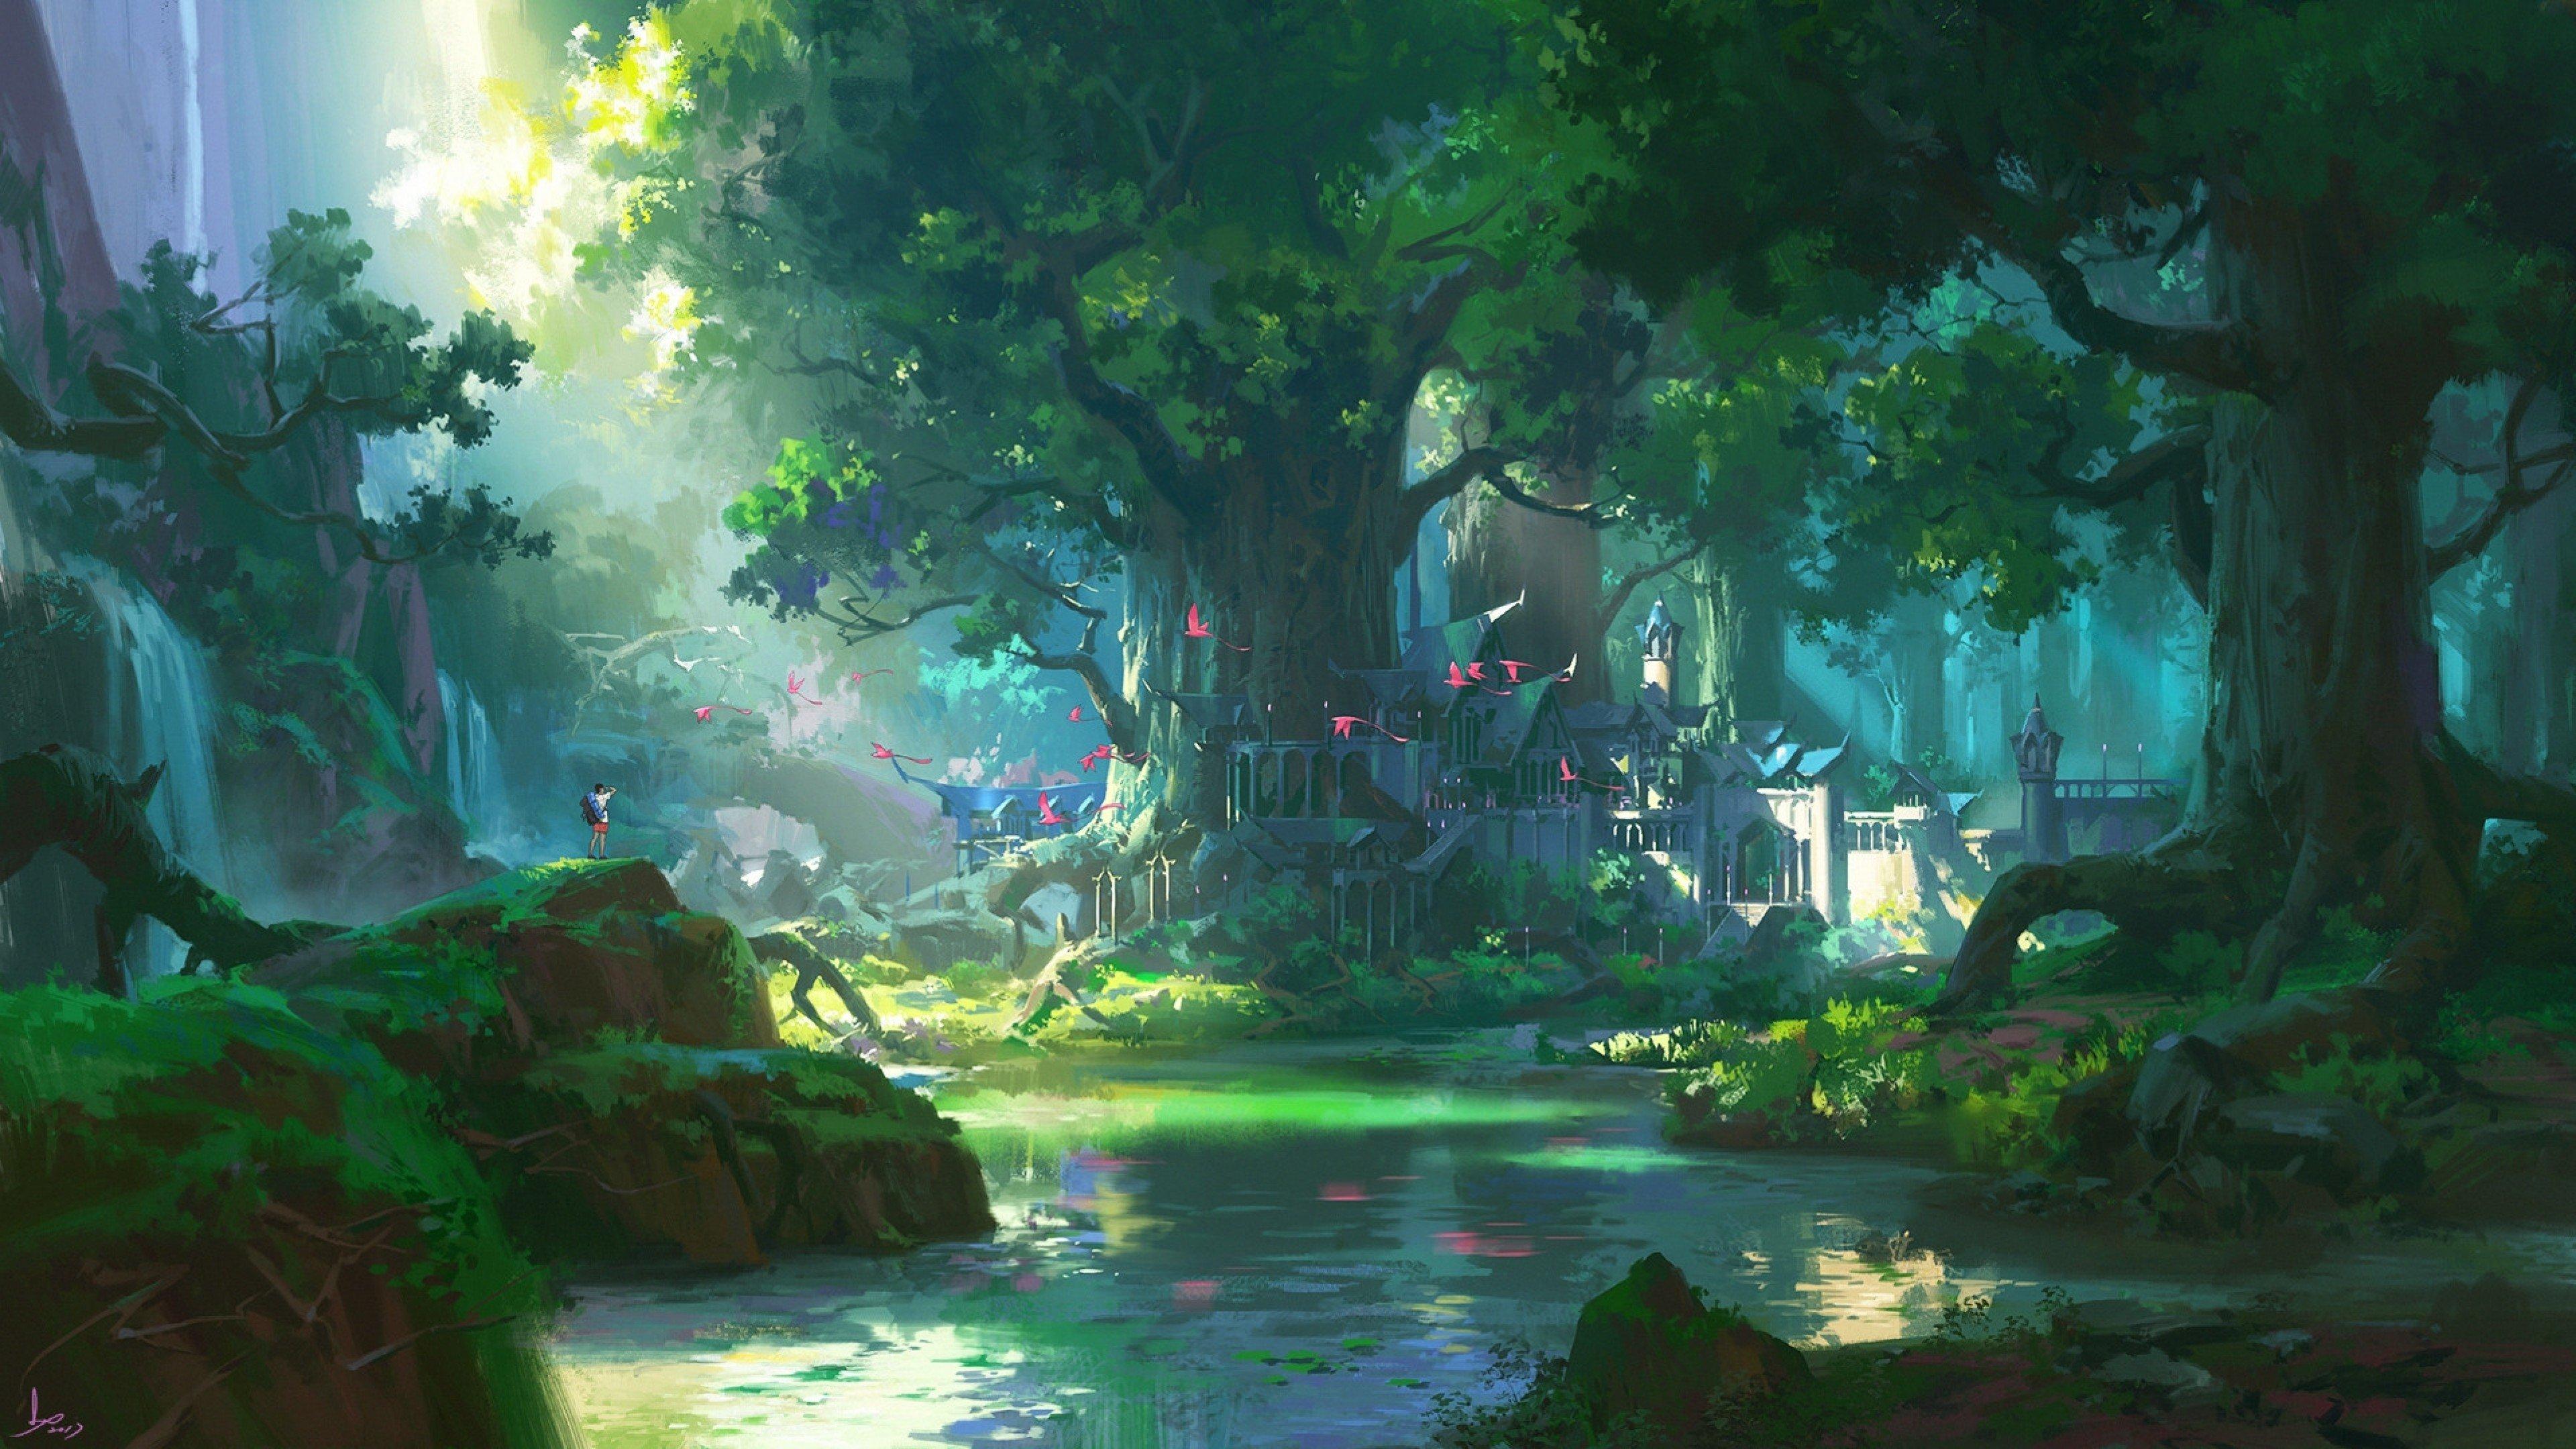 Anime Forest Scenery 4K wallpaper 3840x2160